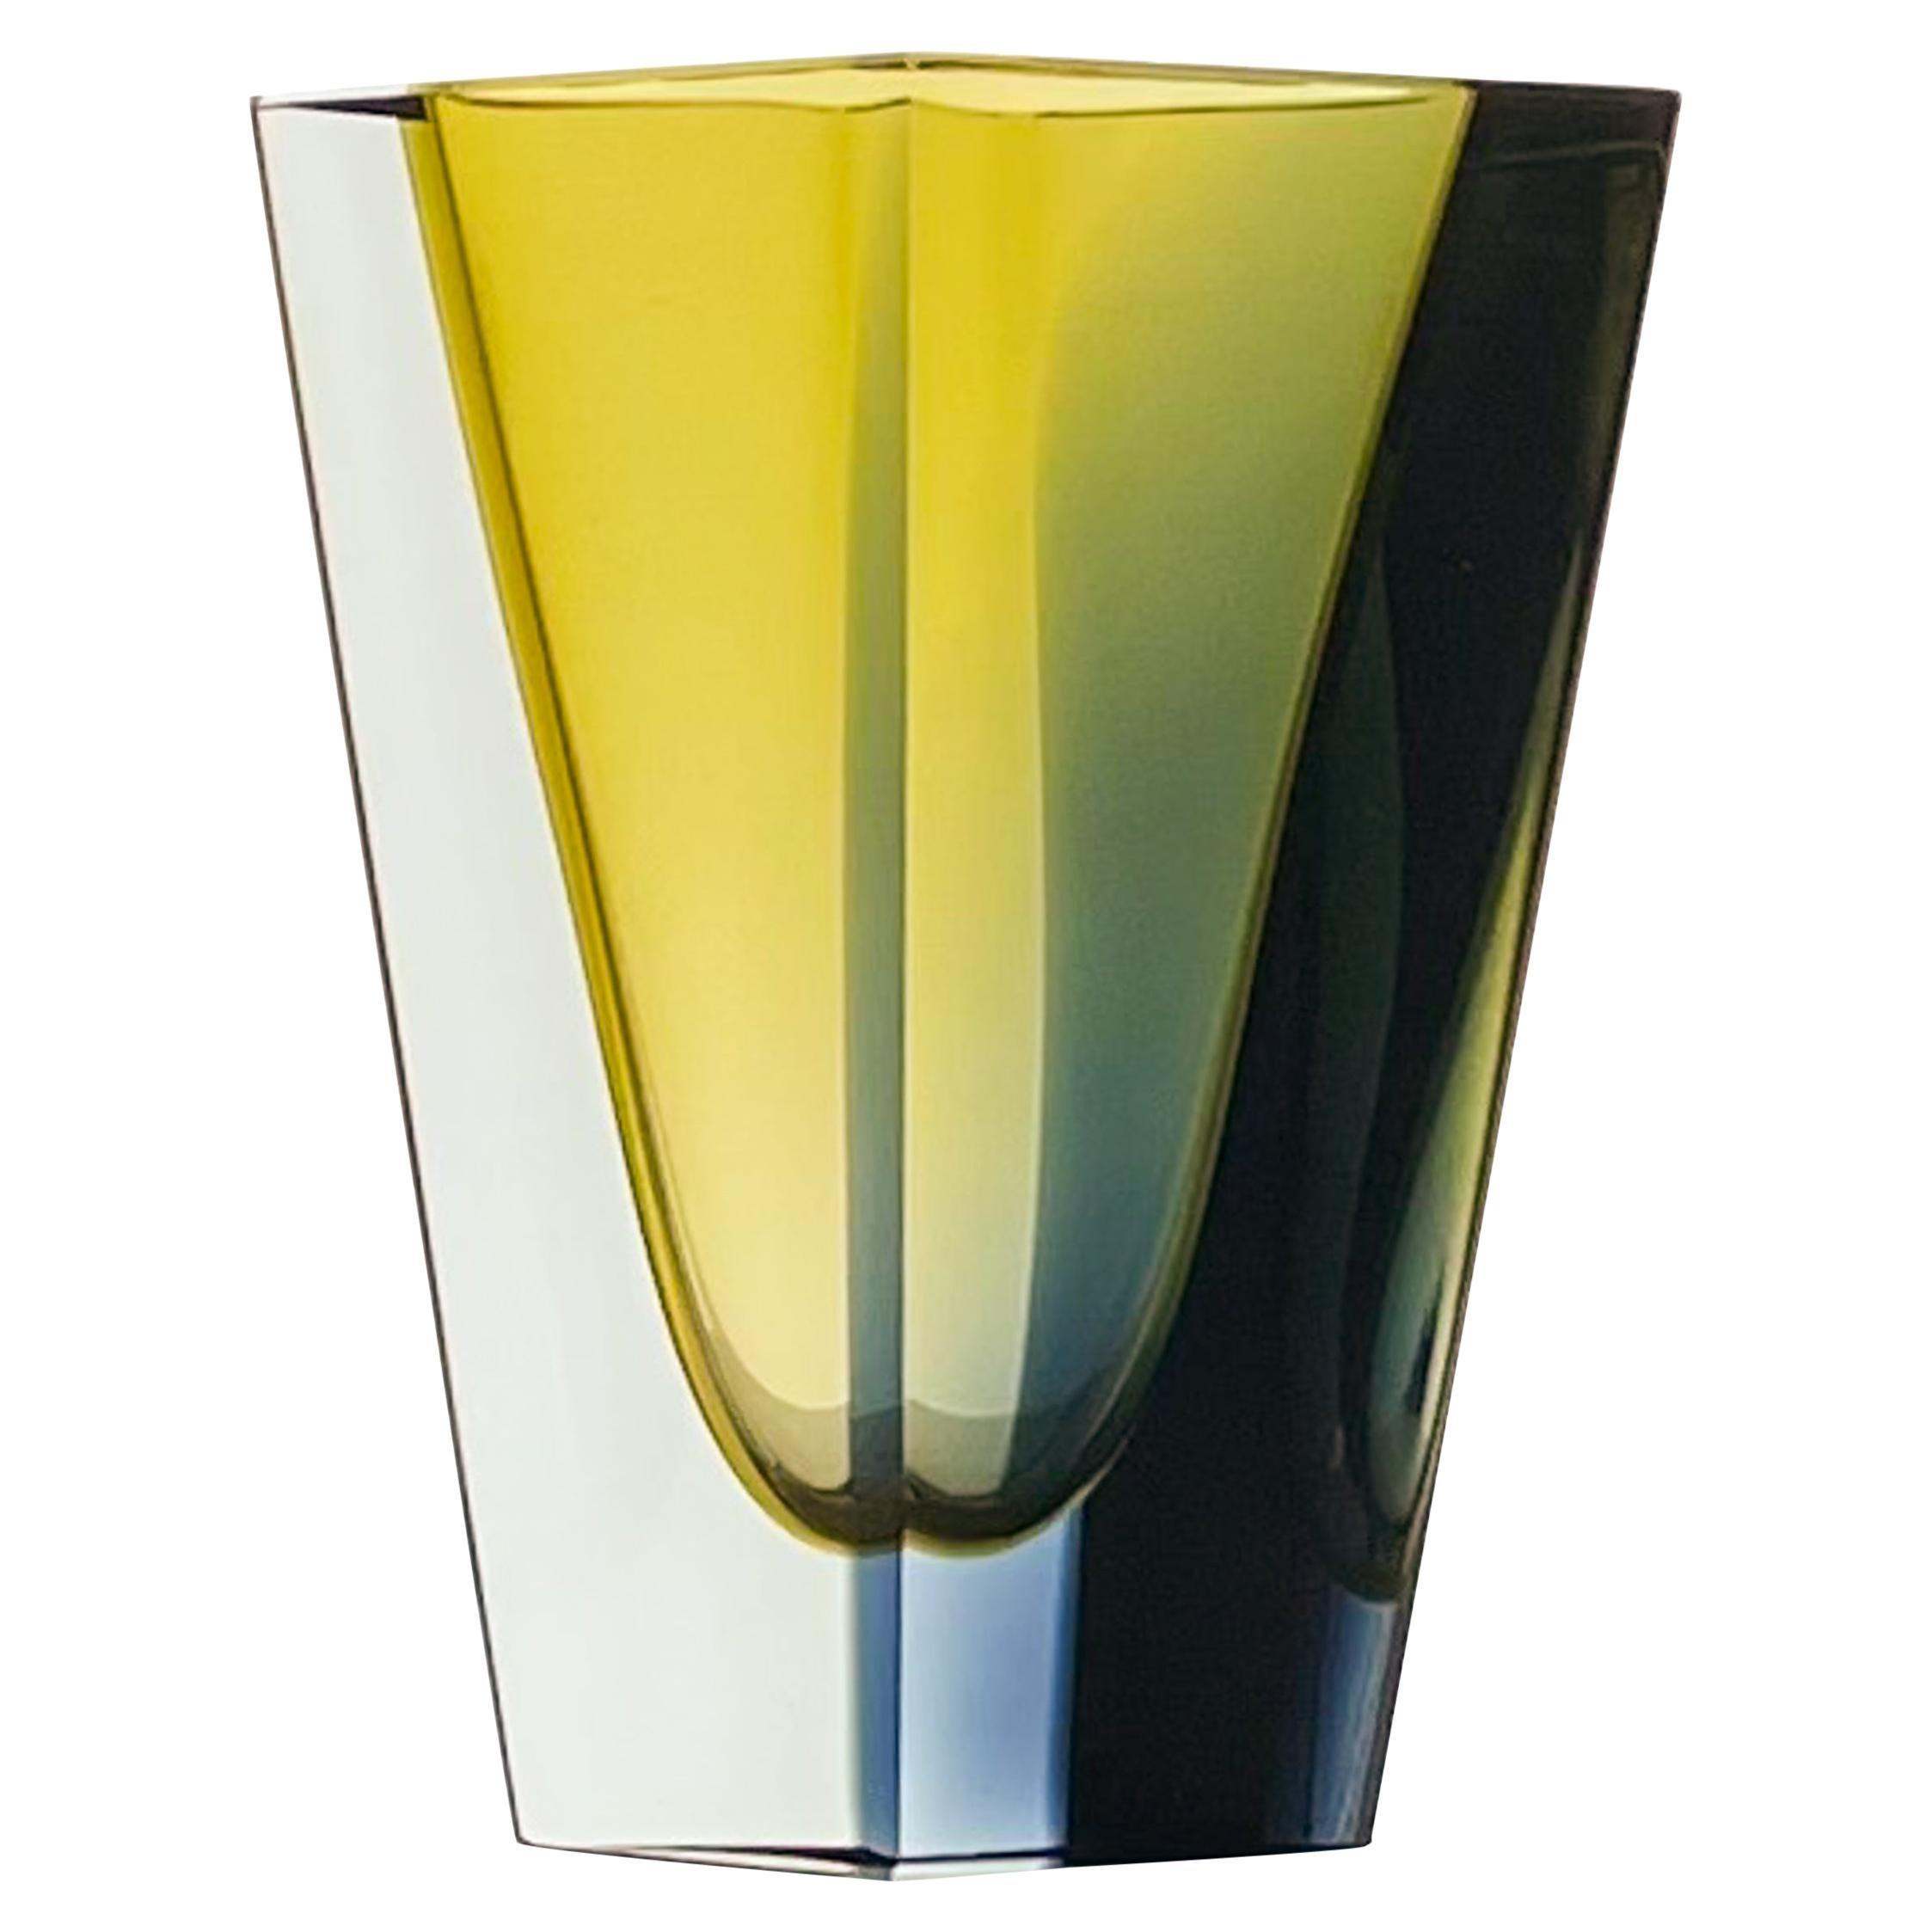 "Kaj Franck, Glass Art-Object ""Prisma"", Model KF 215, Nuutajärvi-Notsjö, 1963"